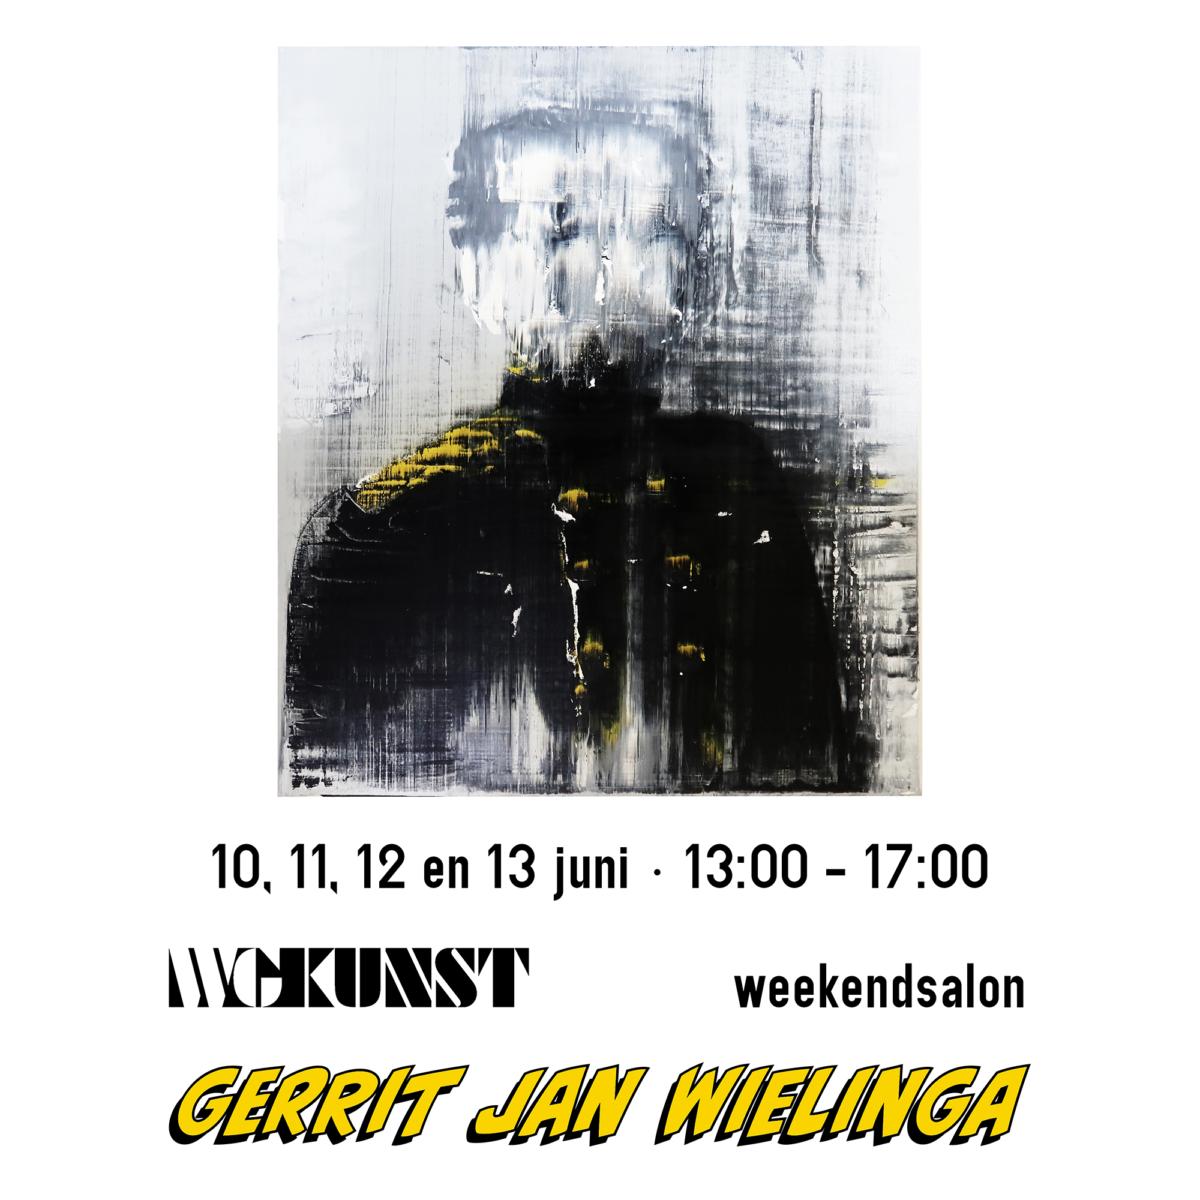 Gerrit Jan Wielinga